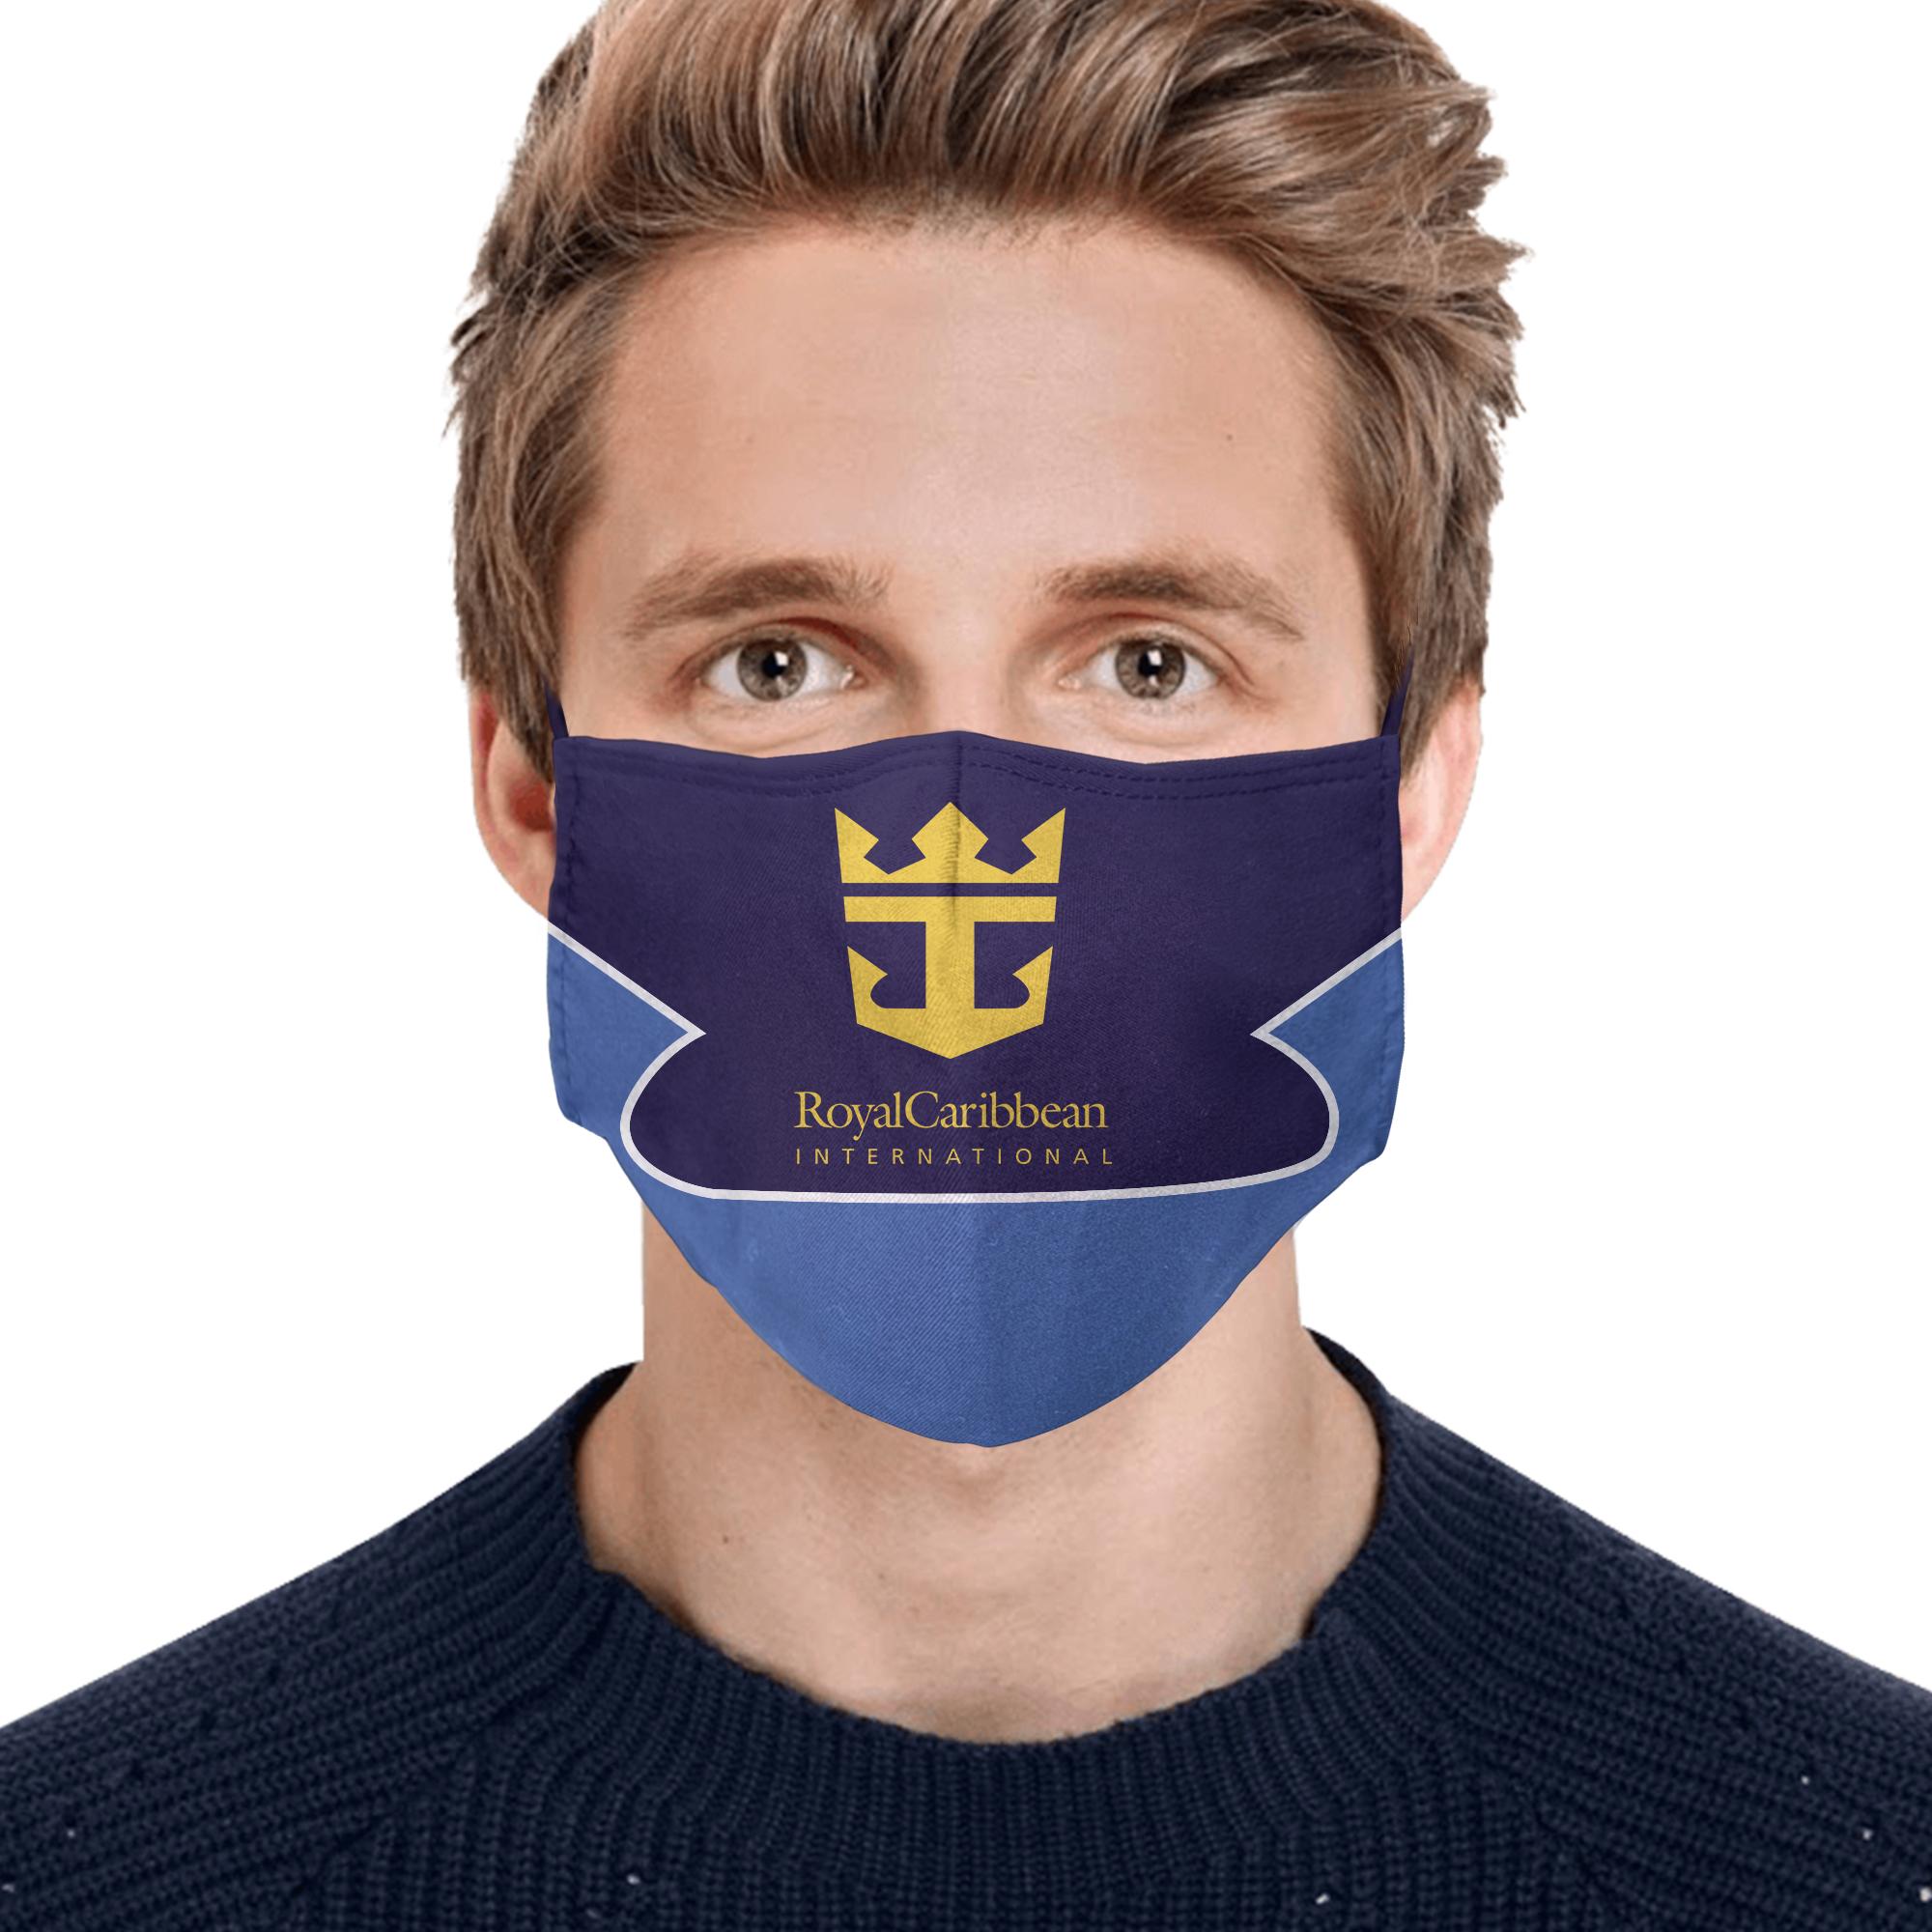 Royal caribbean international full printing face mask 1